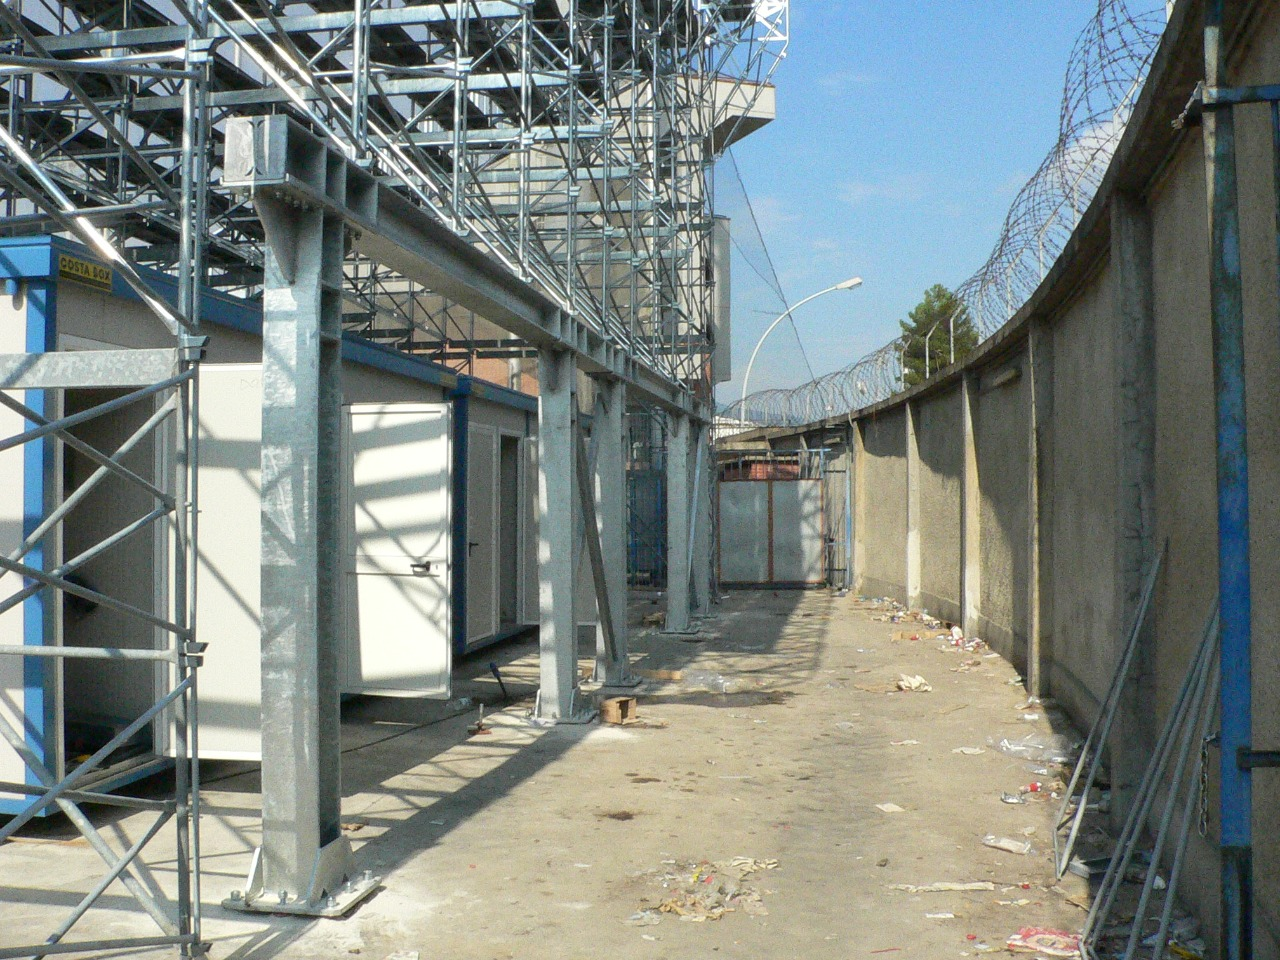 Gallery foto n.2 Support scaffolding - Carlo Castellani Stadium